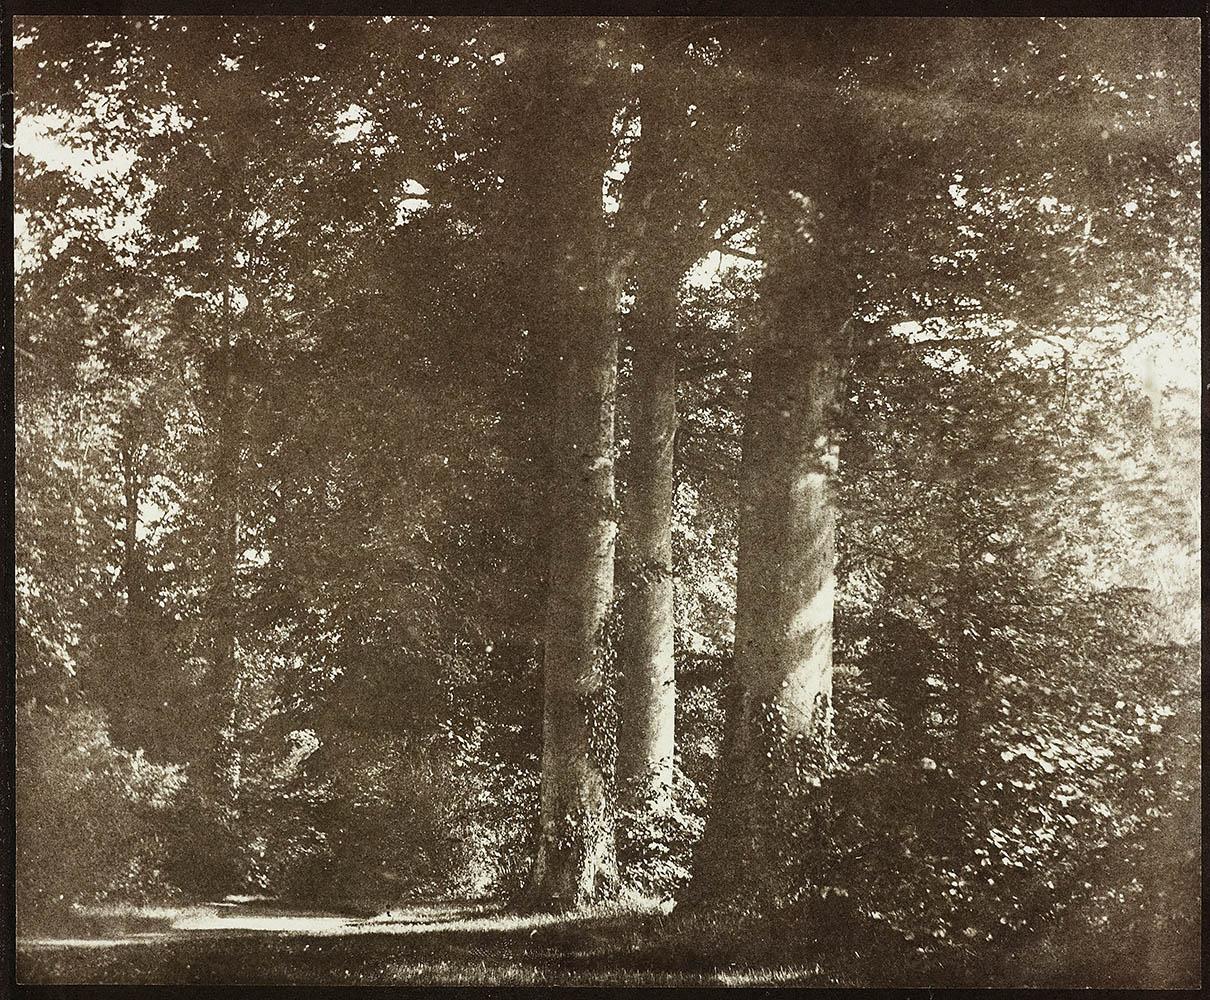 SC97_1937-2043-1